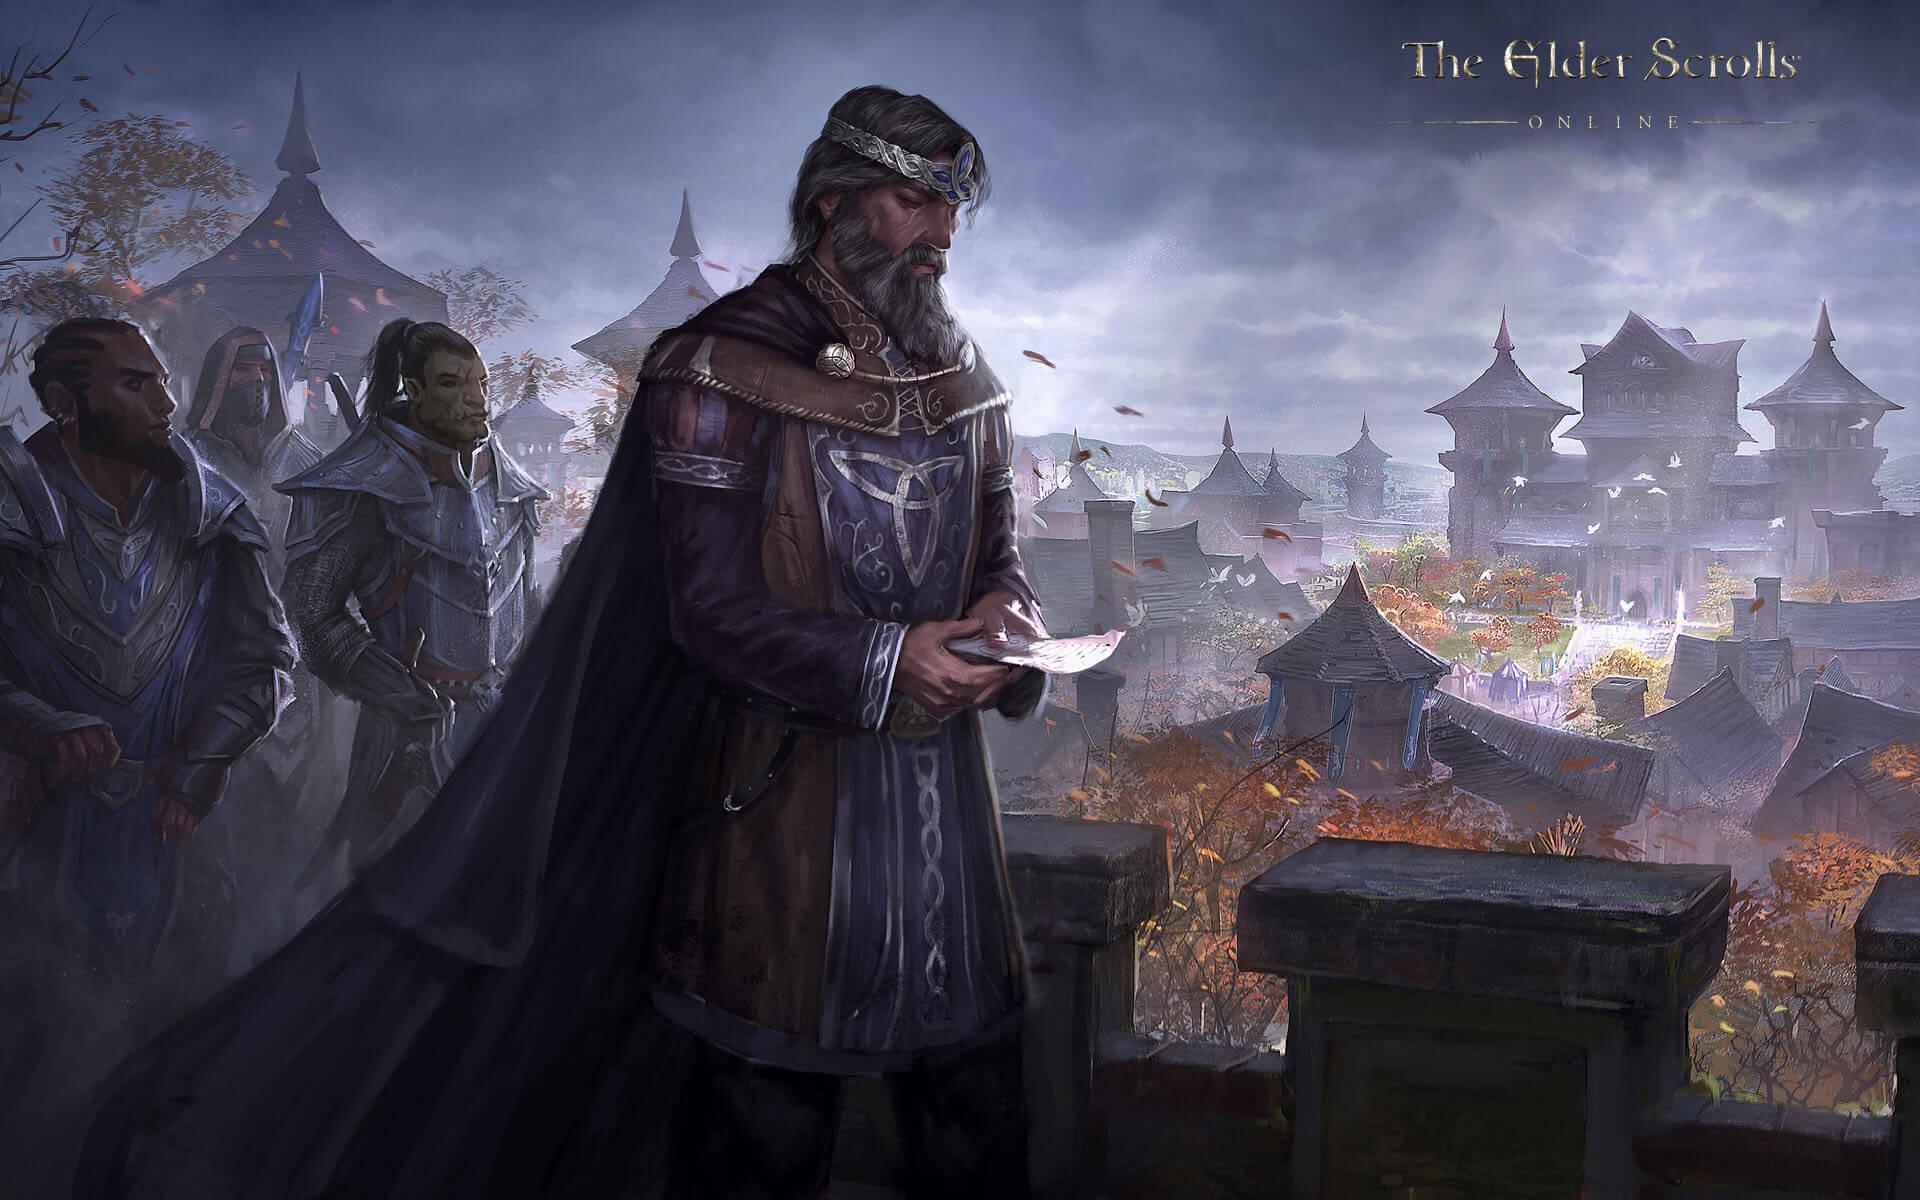 The Elder Scrolls Online: Meet High King Emeric, Leader of The Daggerfall Covenant